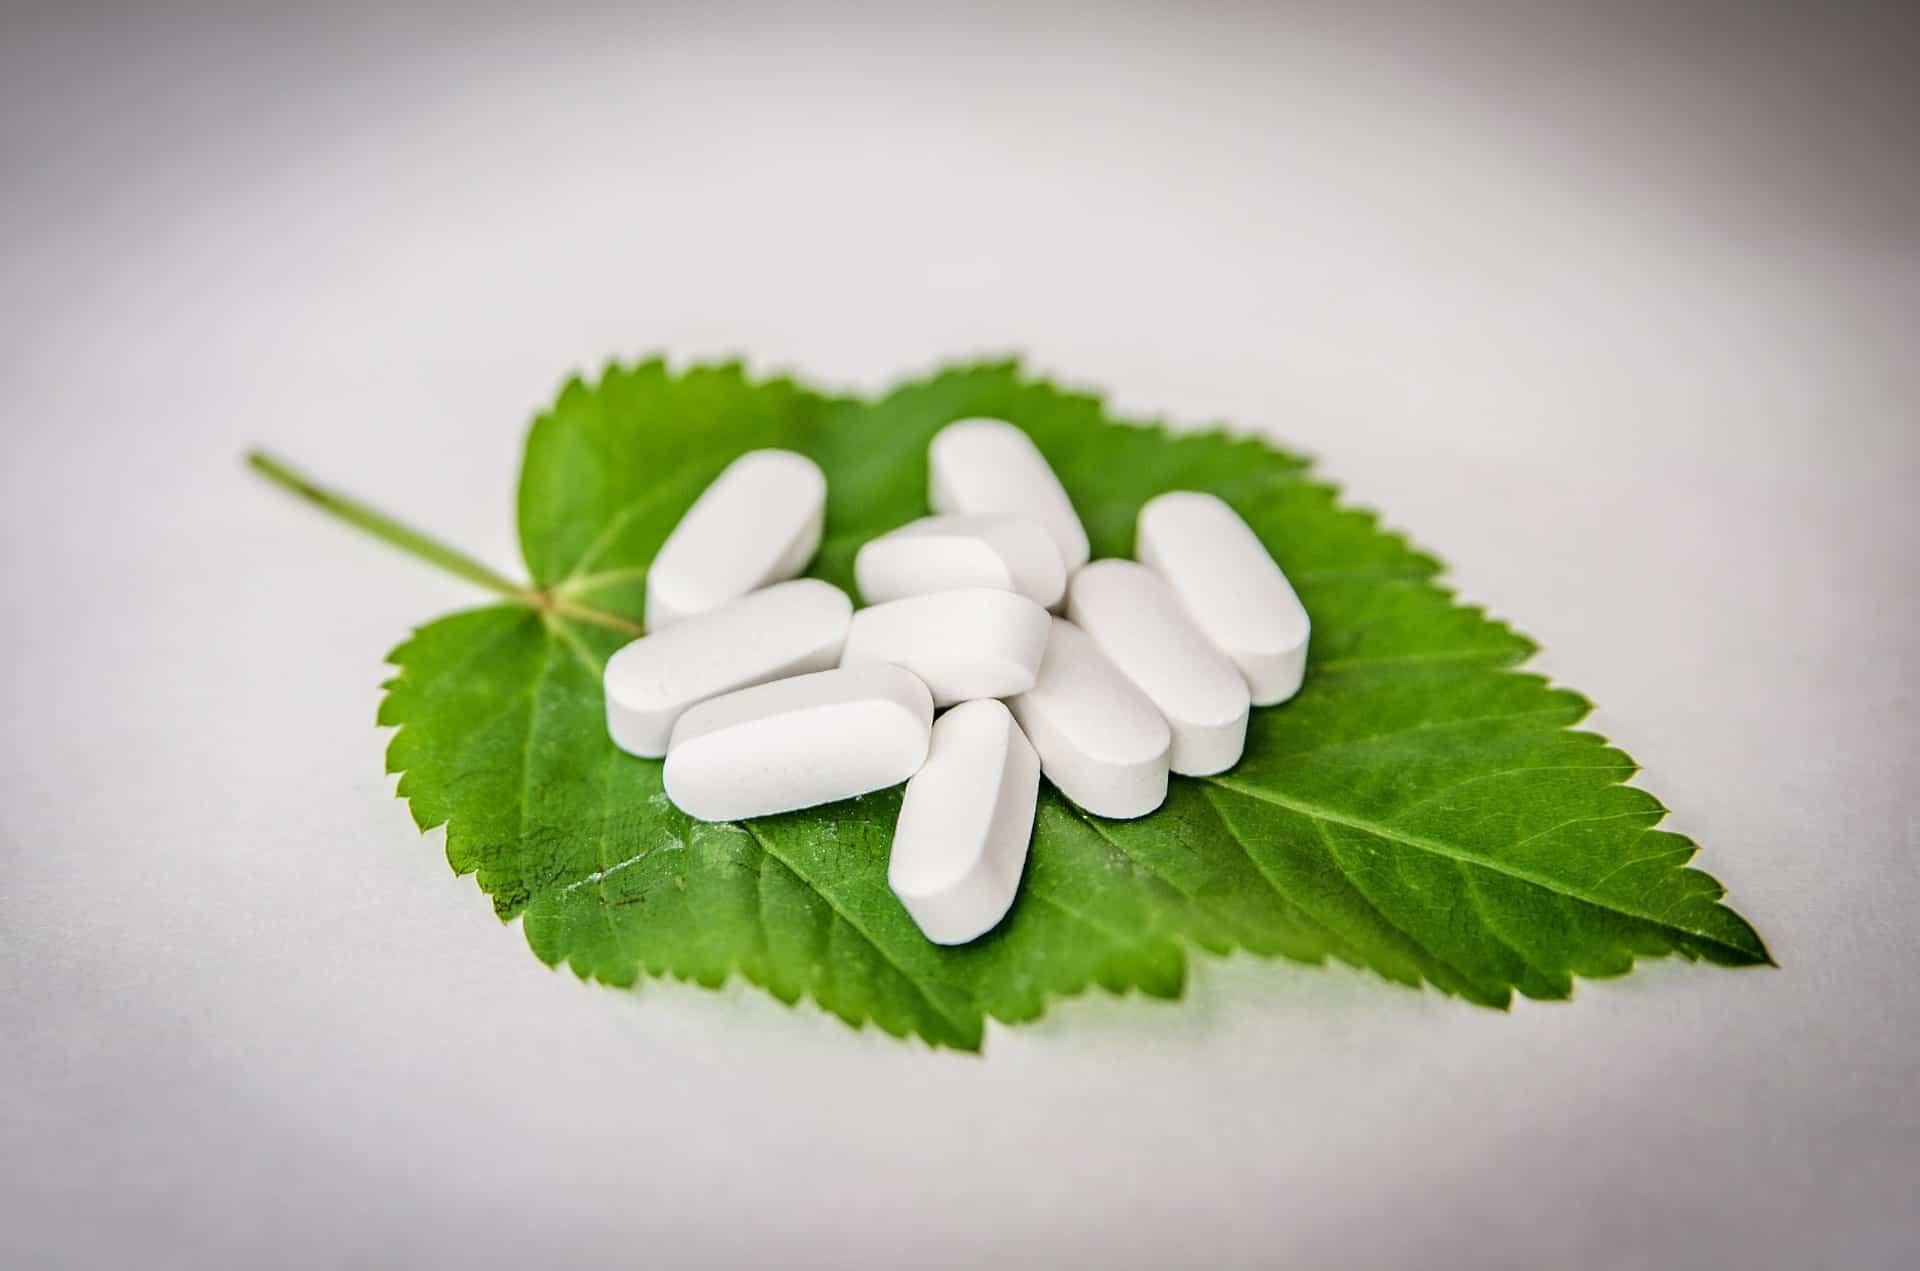 medications-257346_1920